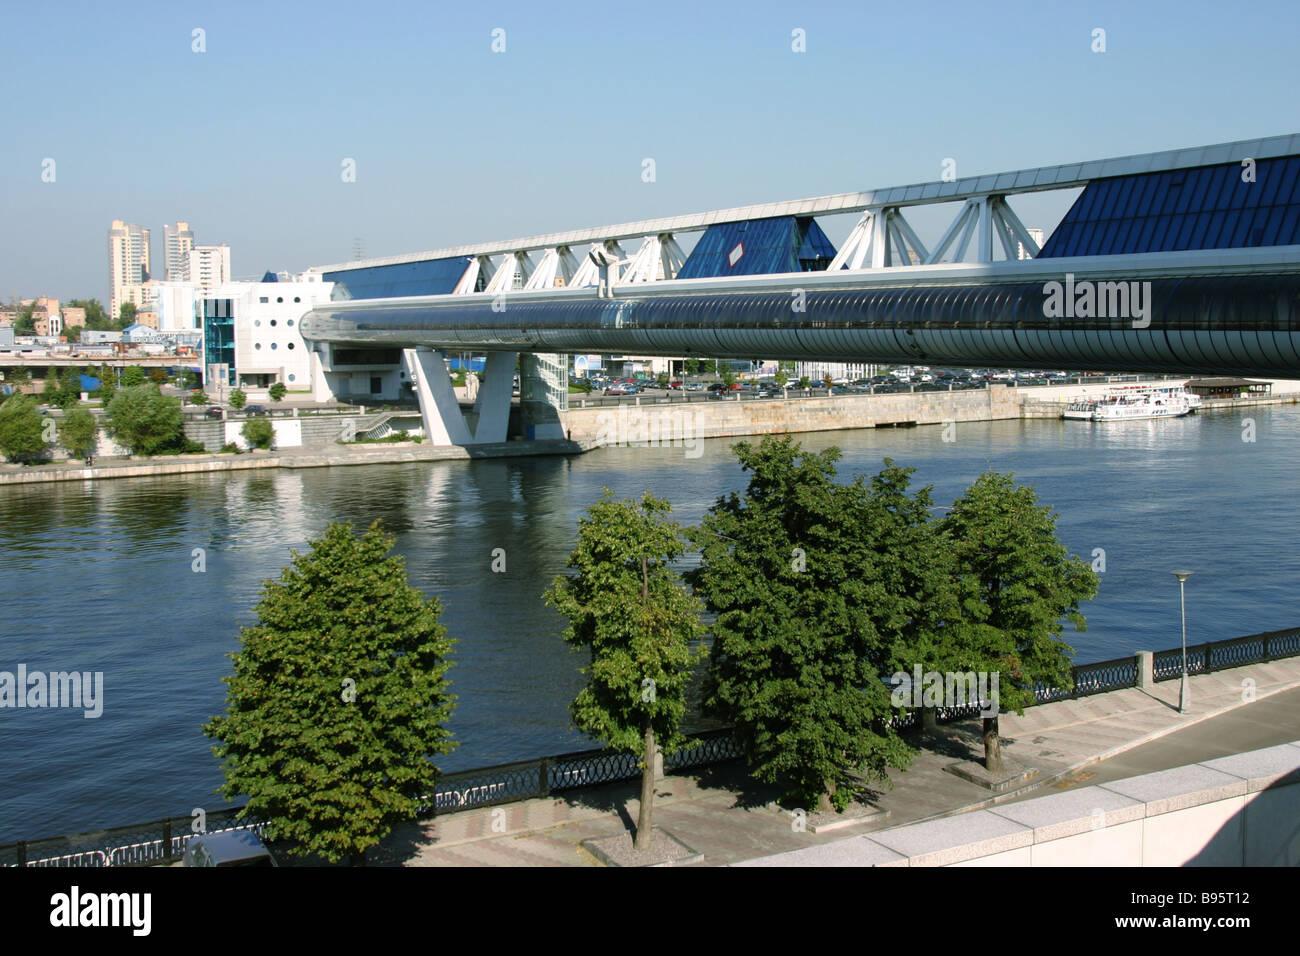 Bagration bridge in Kutuzov Avenue - Stock Image